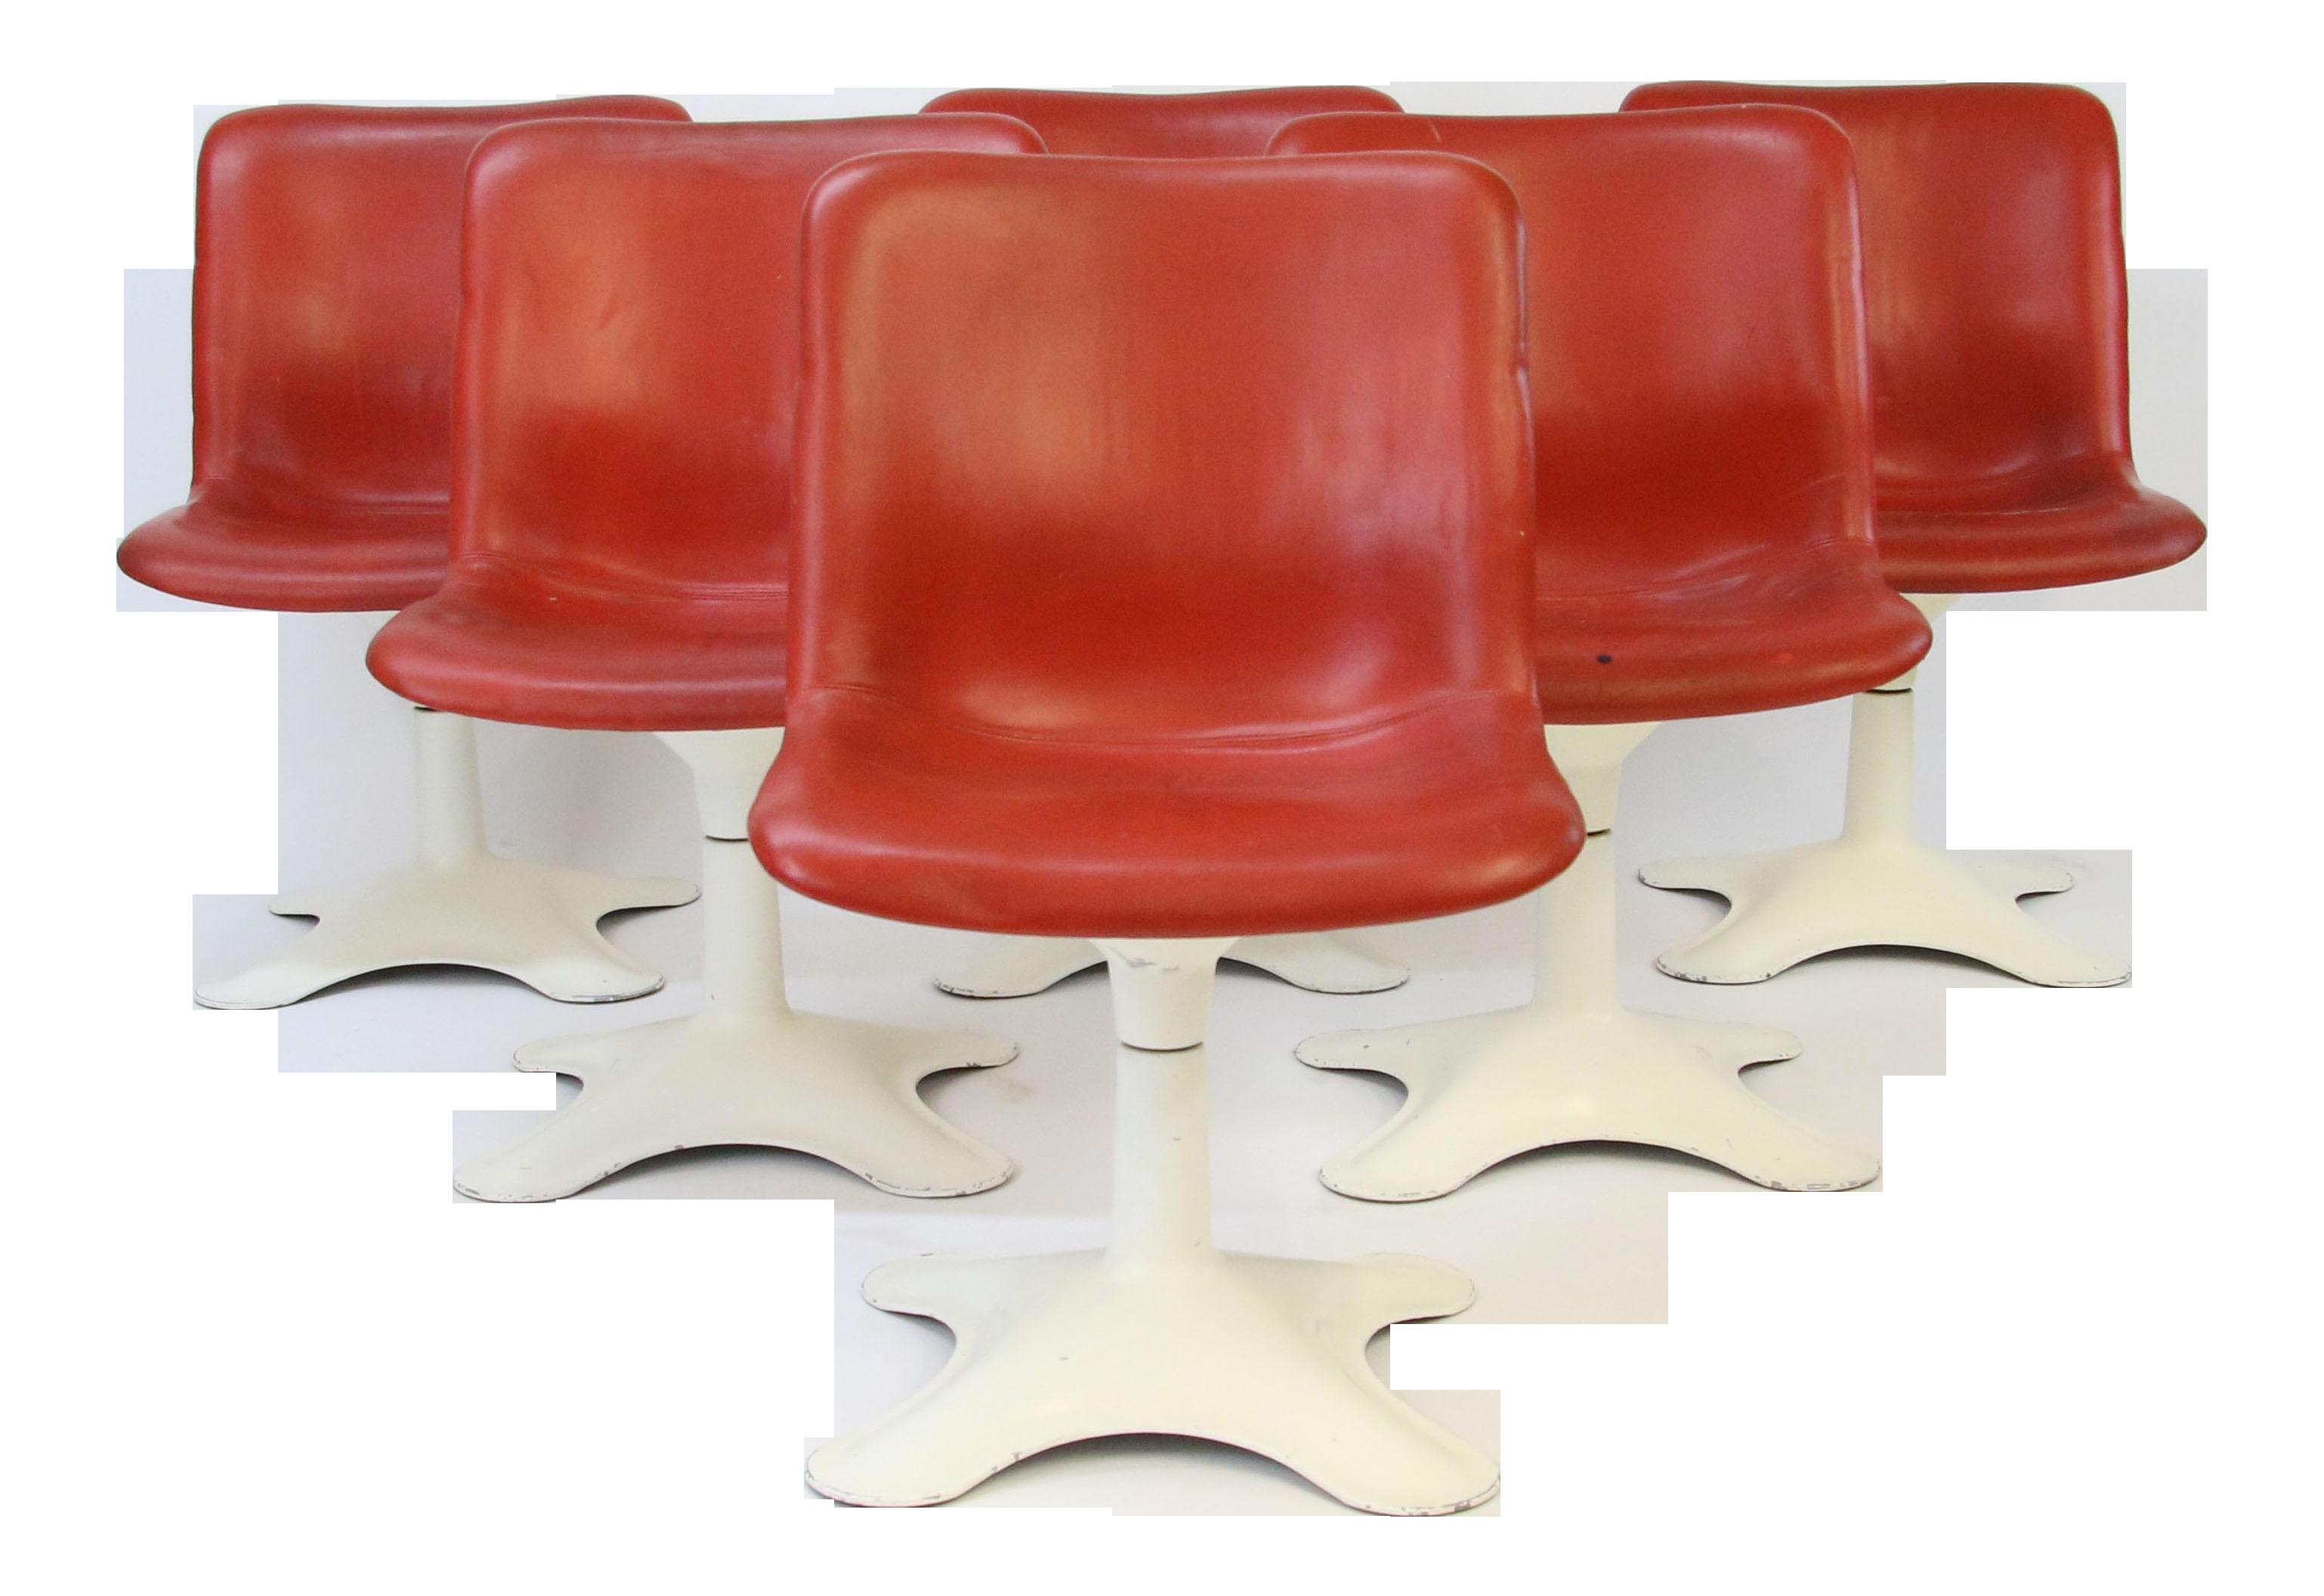 Pleasing Mid Century Modern Yrjo Kukkapuro For Haimi Finland Leather Dining Chairs Set Of 6 Inzonedesignstudio Interior Chair Design Inzonedesignstudiocom